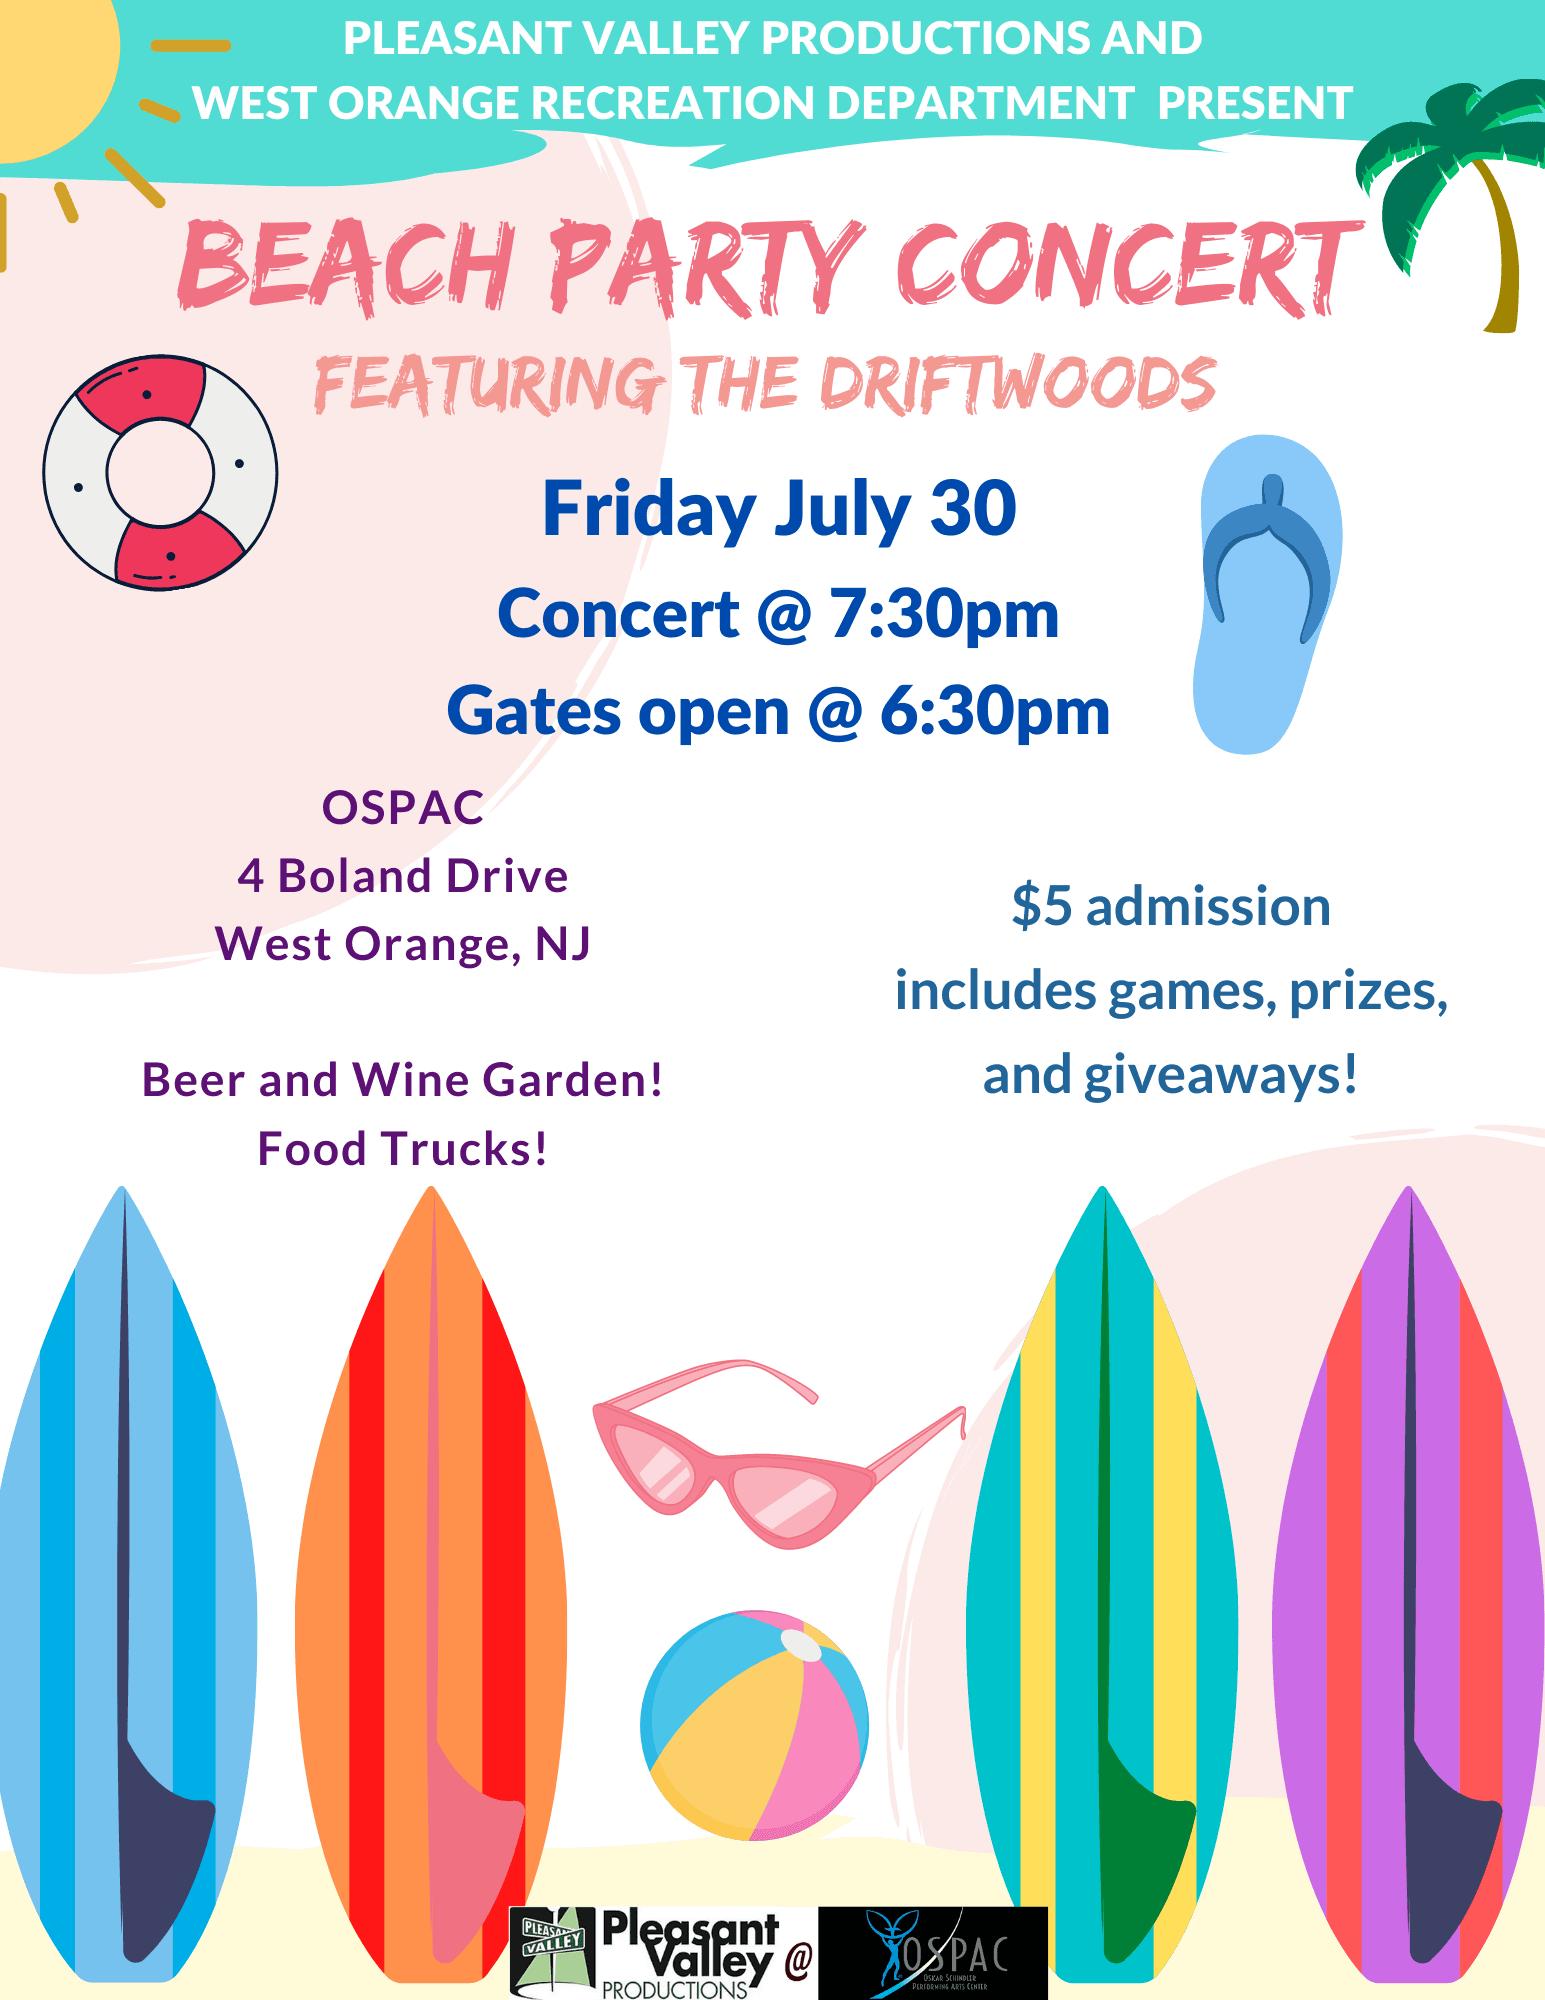 PVP_Beach Party Flyerpng